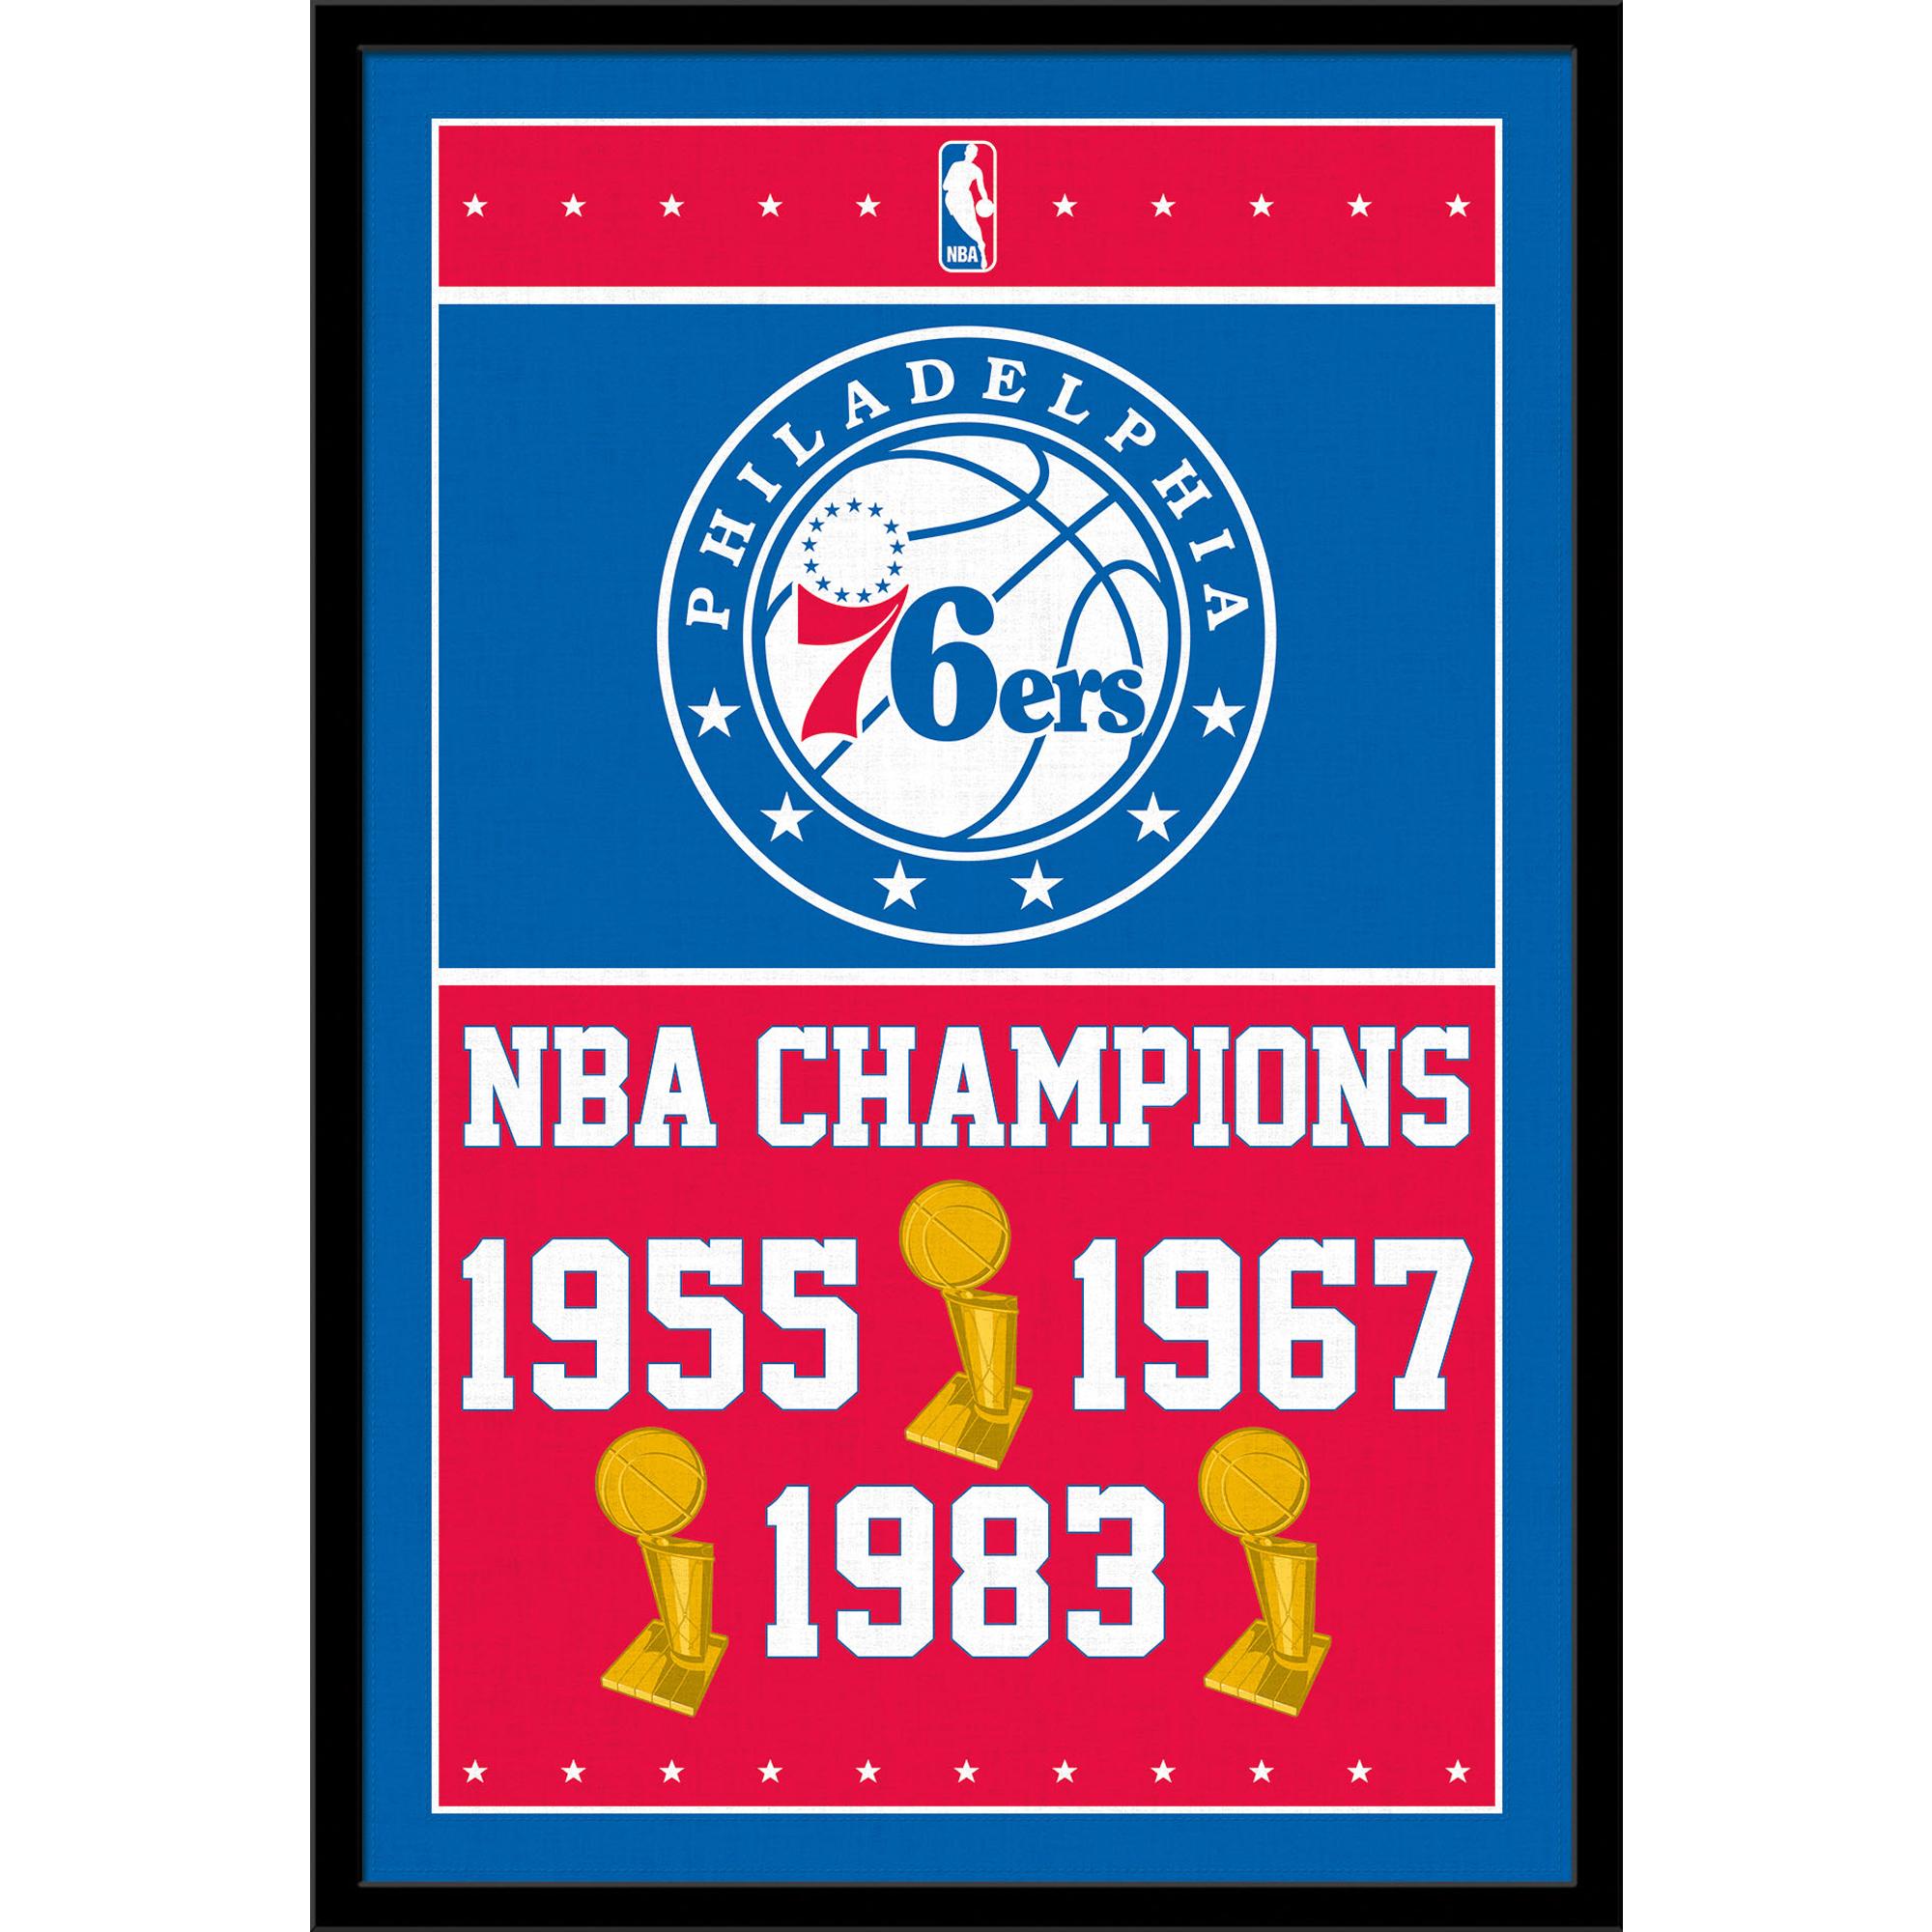 Philadelphia 76ers NBA Finals Champions 24.25'' x 35.75'' Framed Poster - No Size